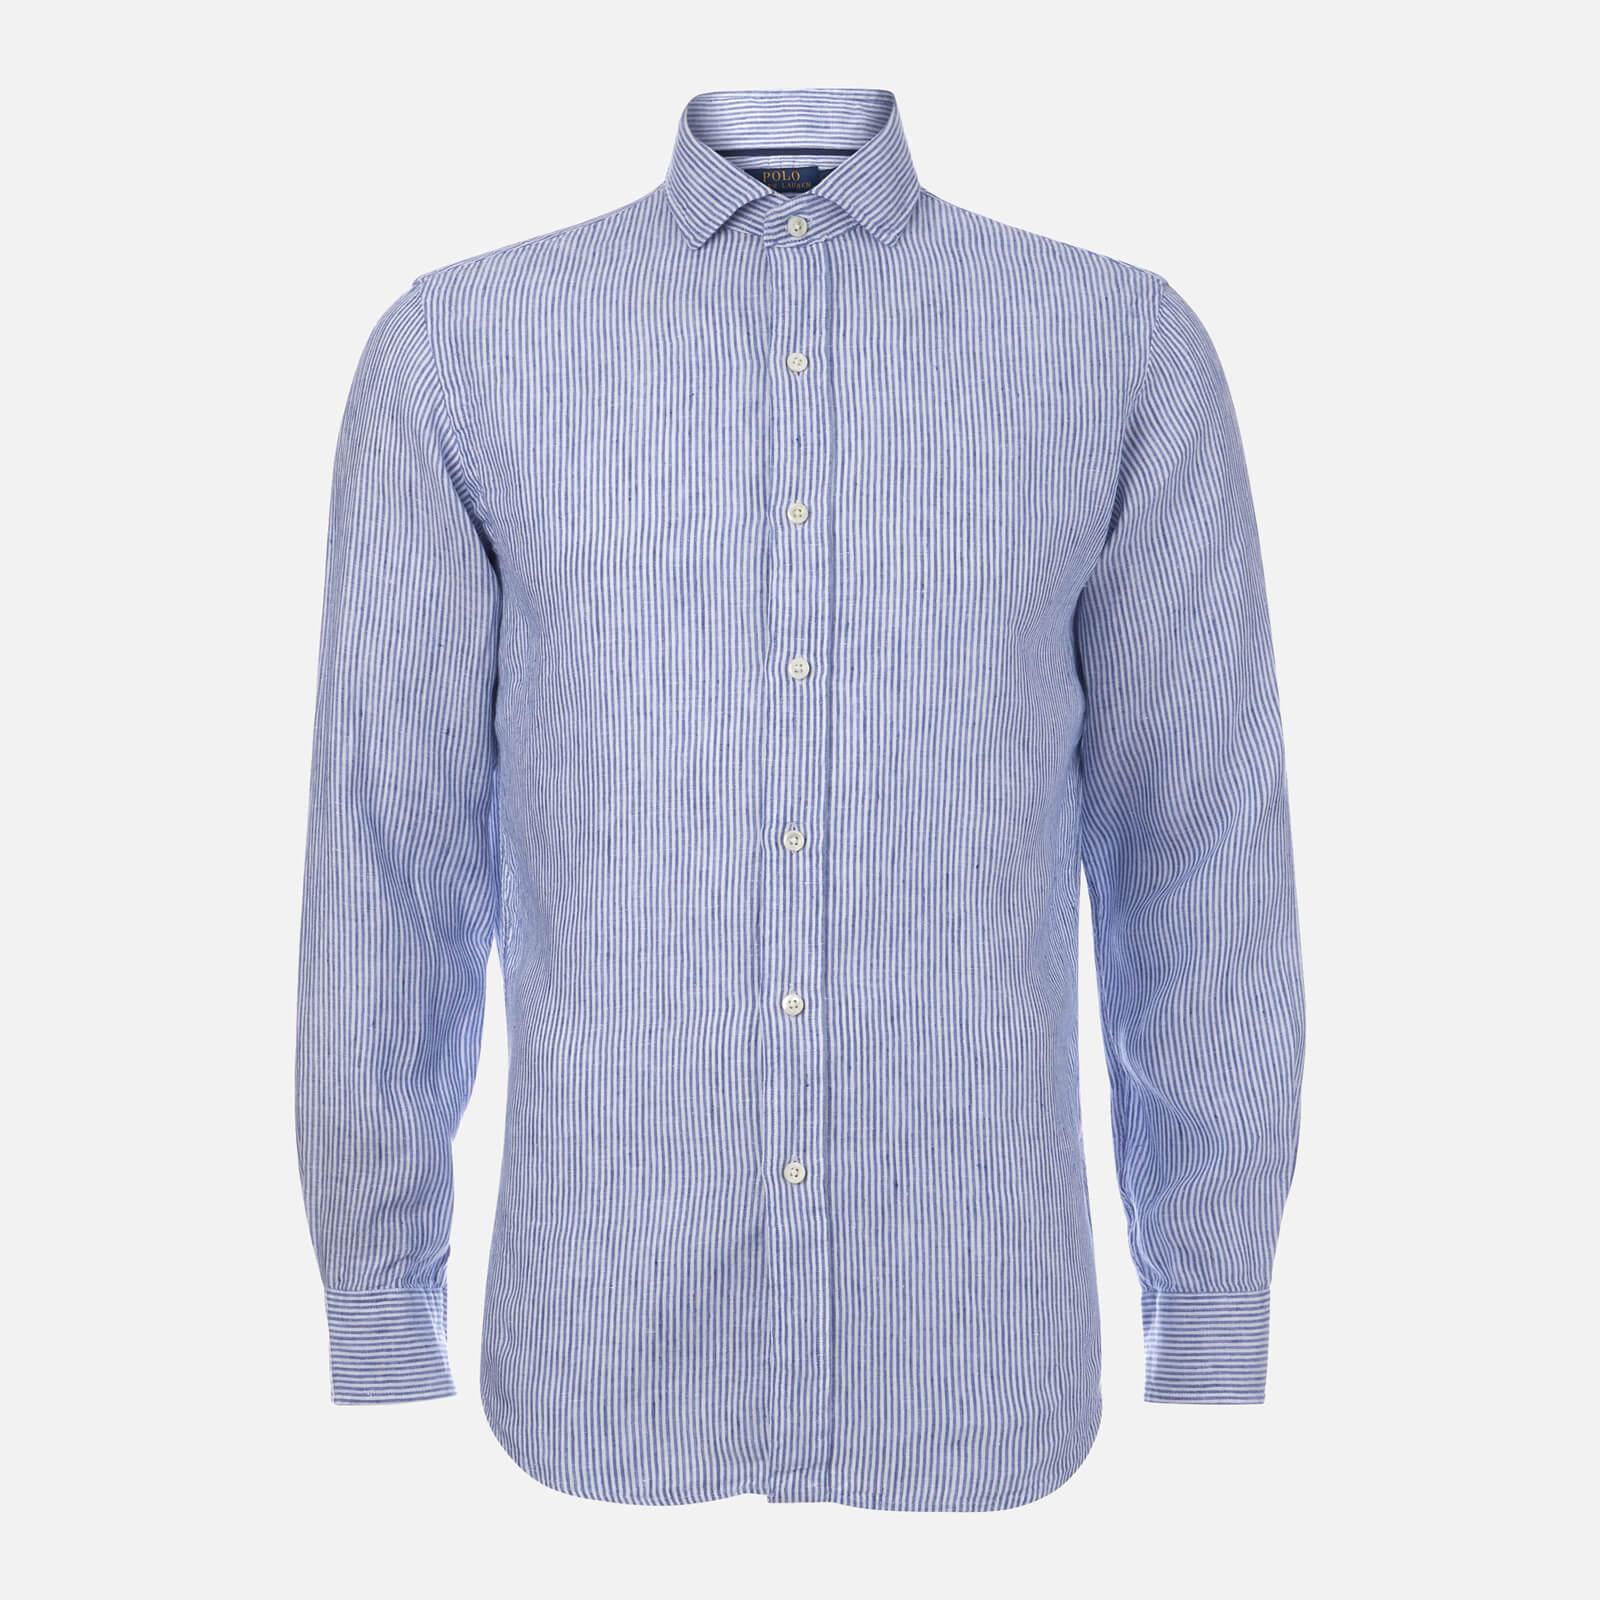 cf4edb09d Polo Ralph Lauren Men s Linen Spead Estate Shirt - Blue - Free UK Delivery  over £50